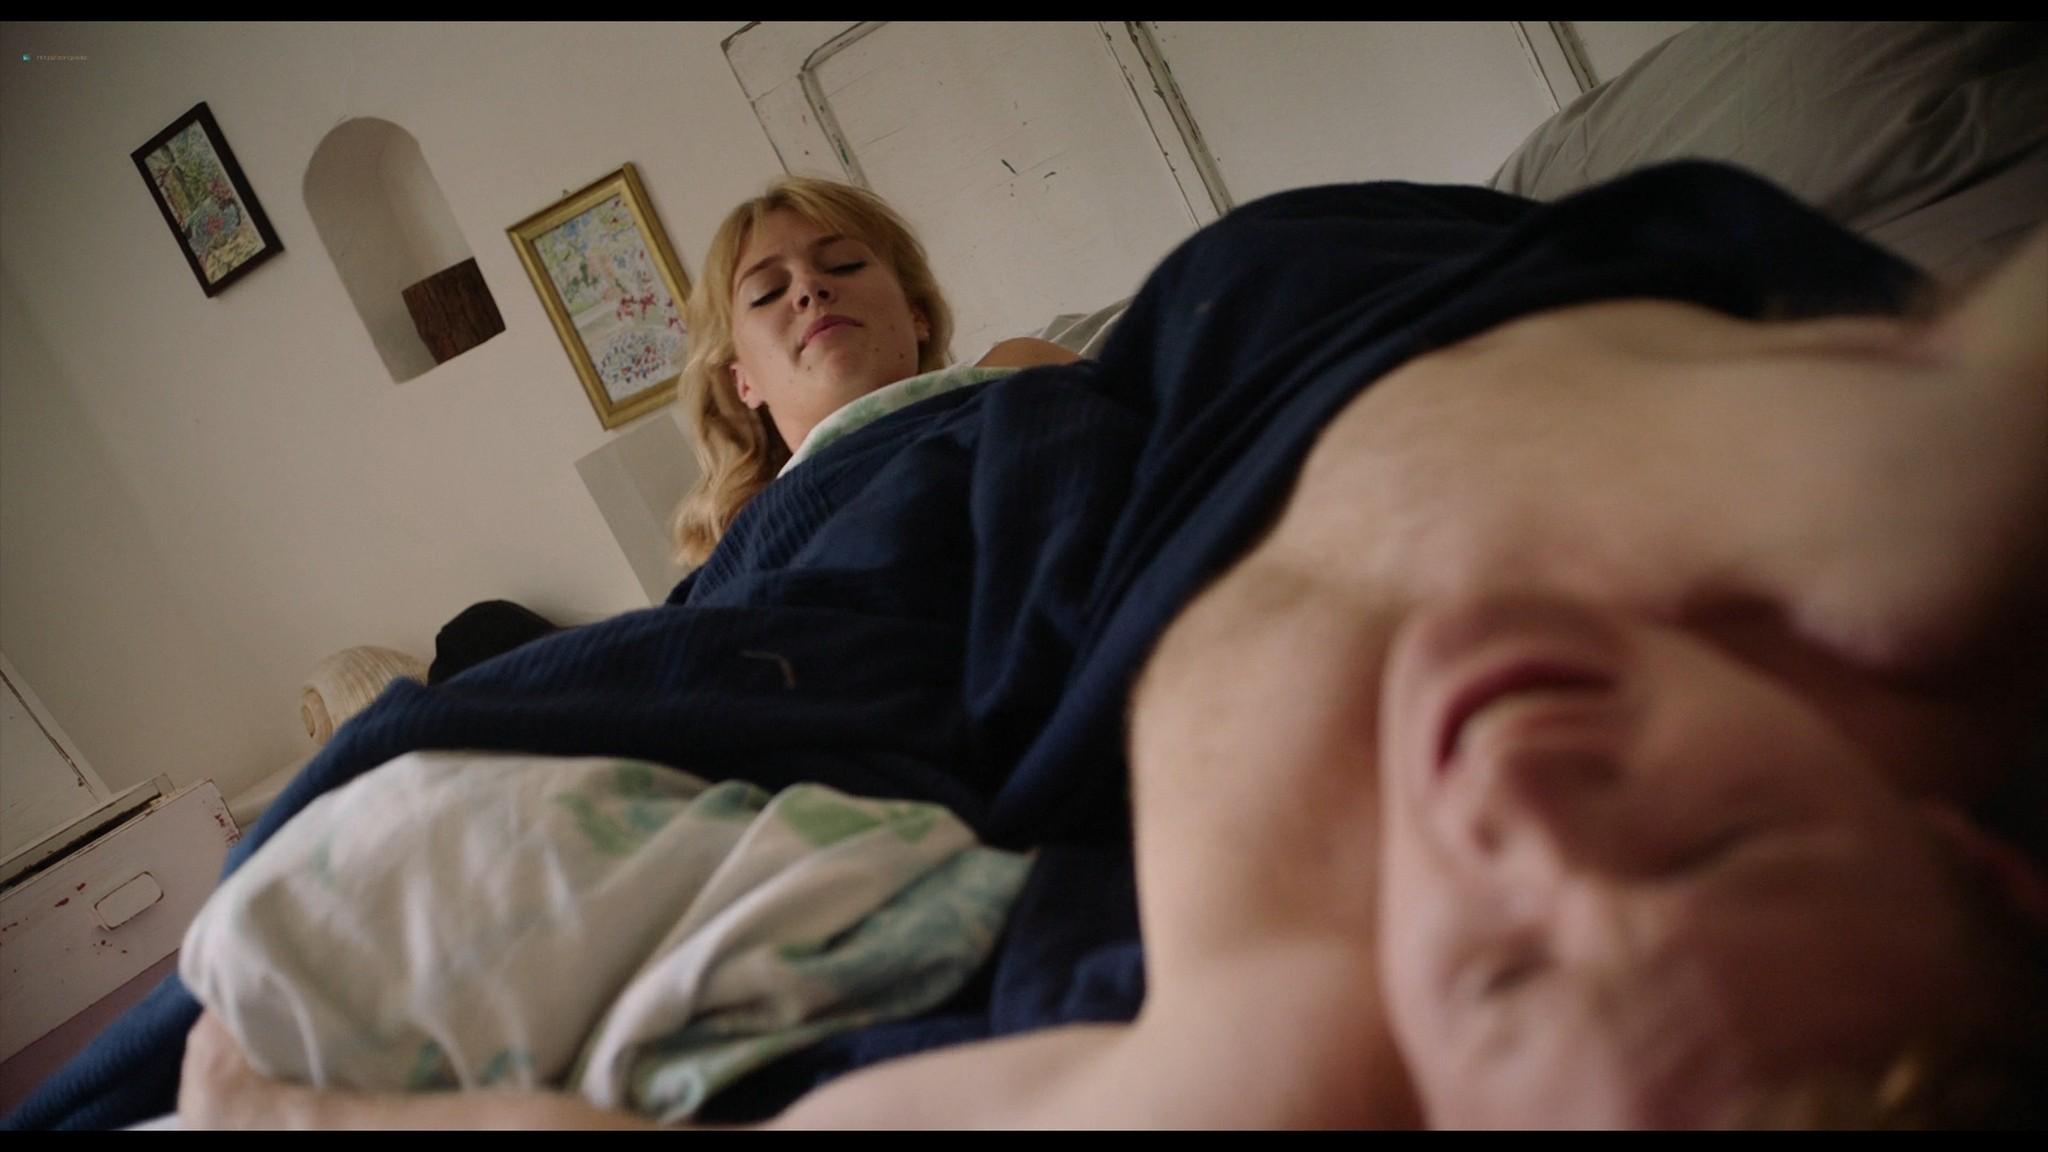 Bianca Cedrone sexy Hannah van der Westhuysen Emma Curtis hot A Little Italian Vacation 2021 1080p Web 9